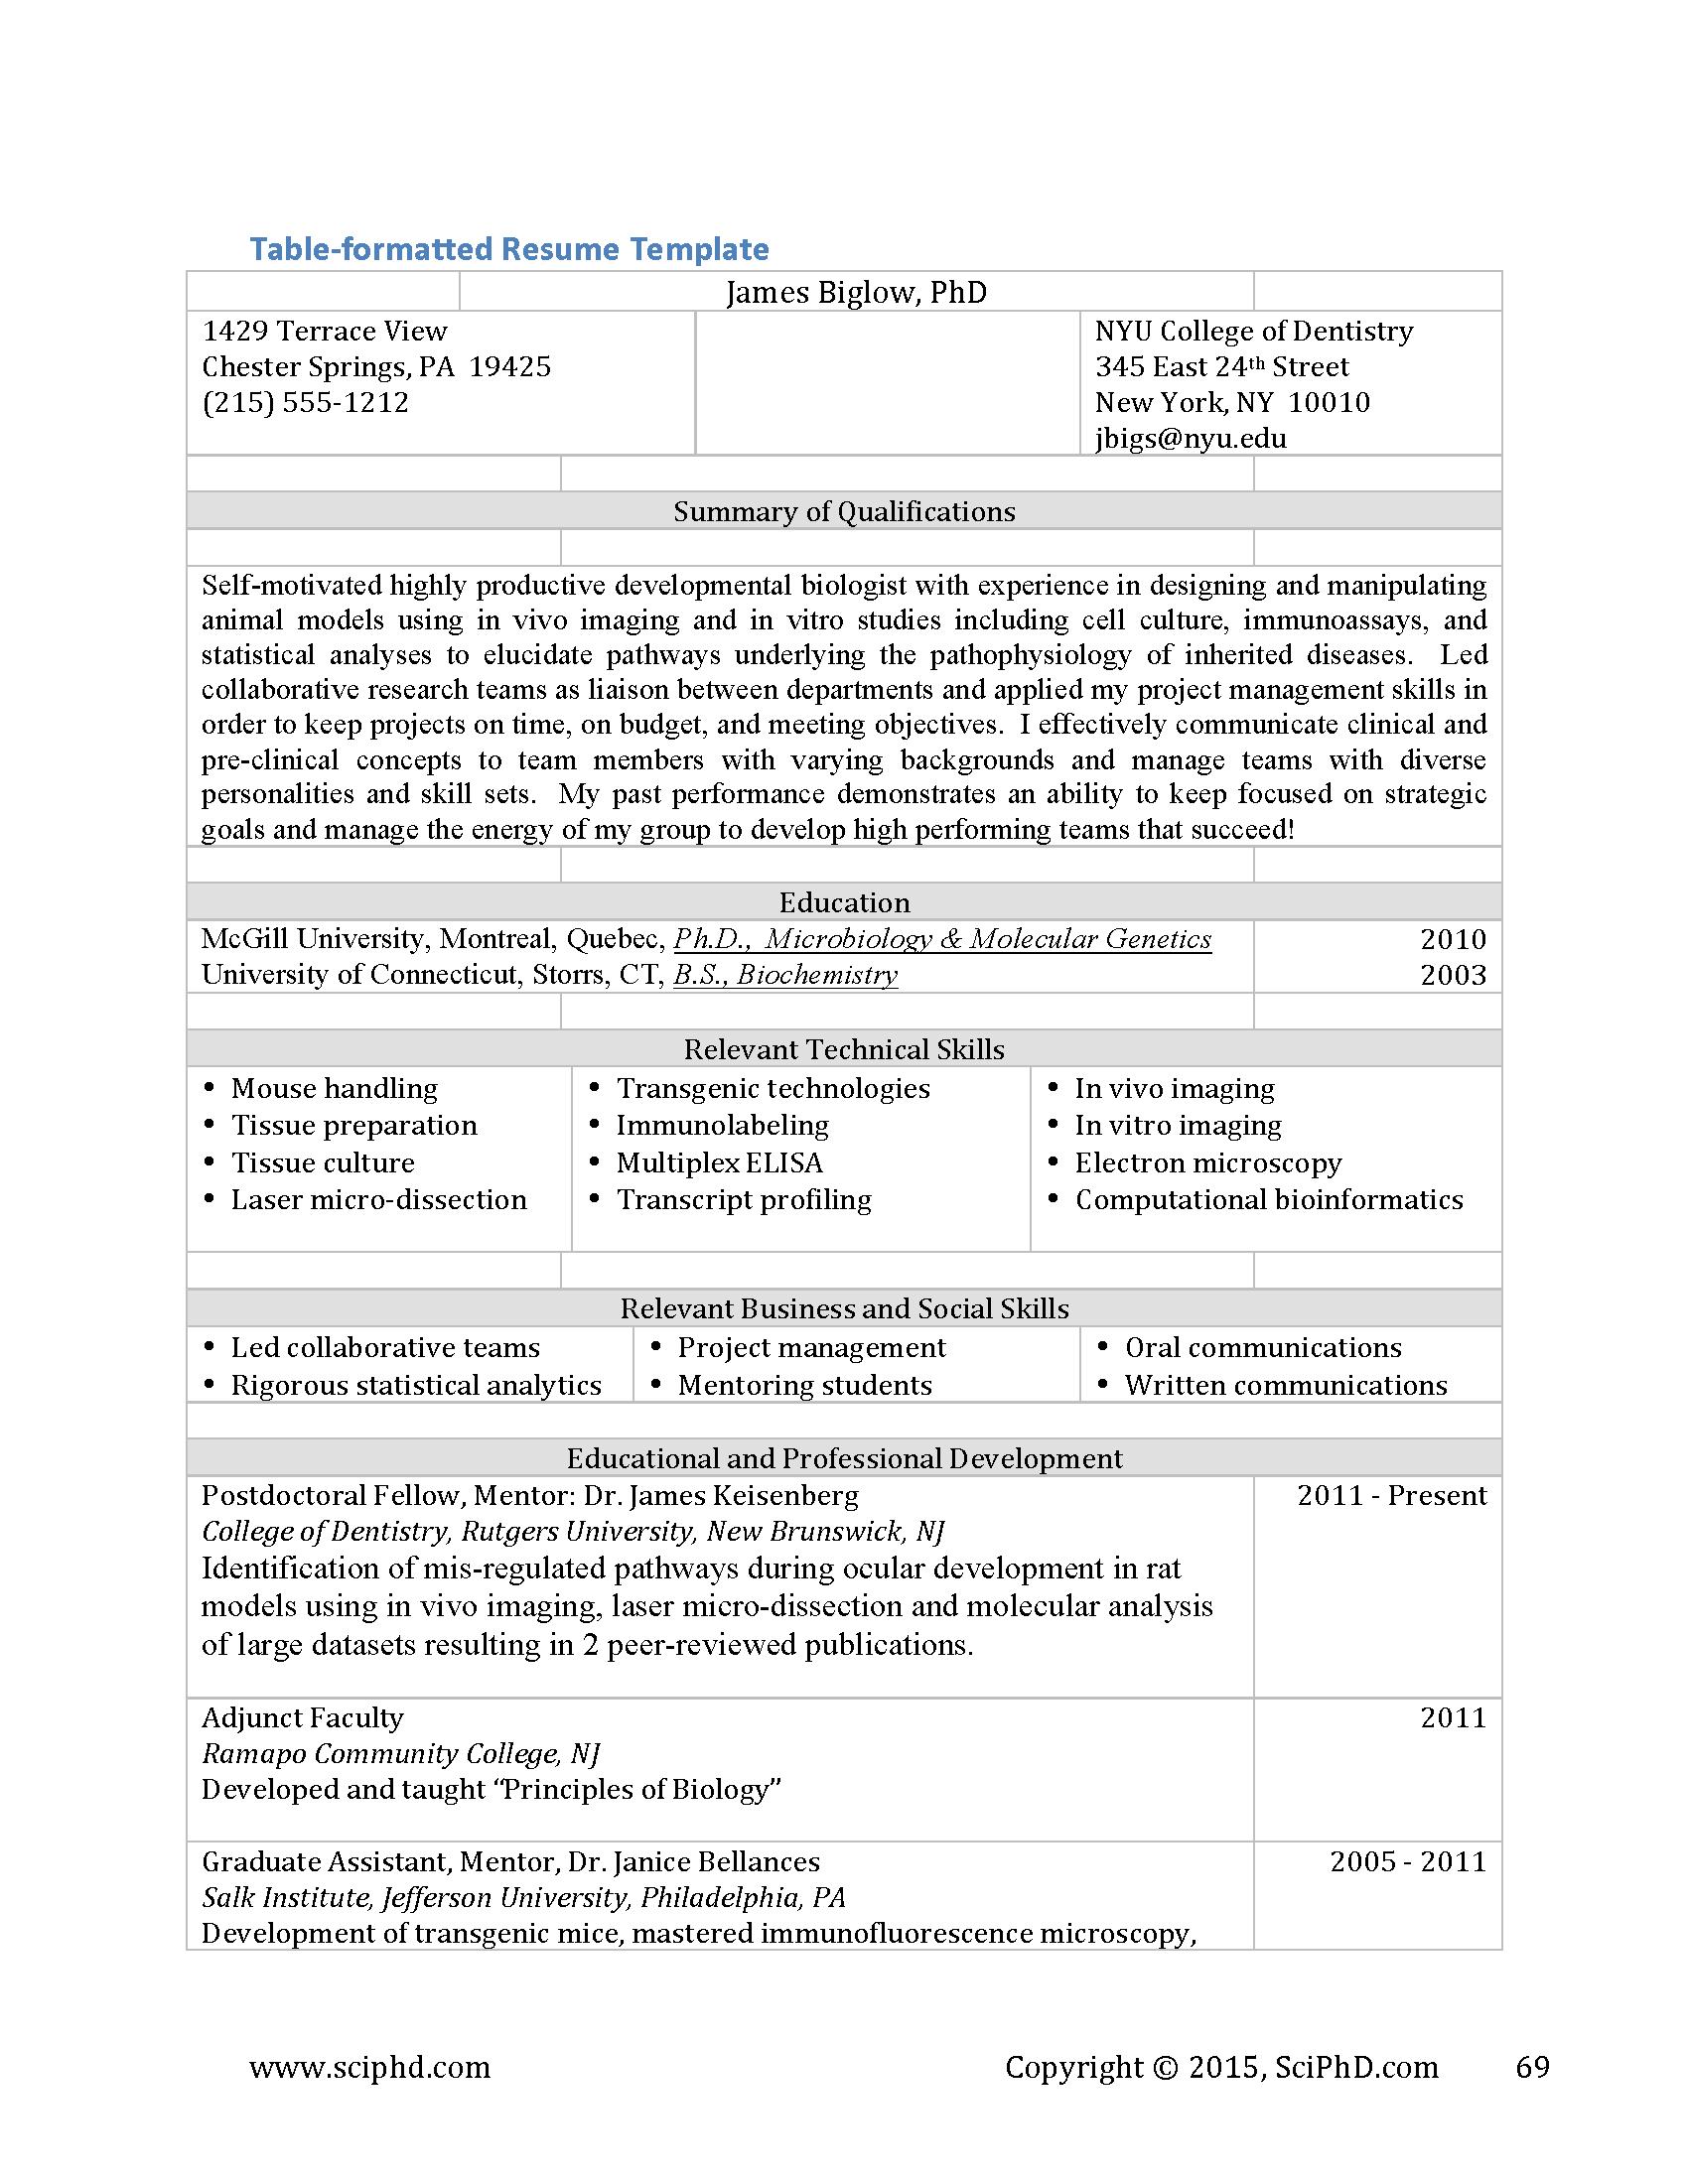 Distribution resume targeted